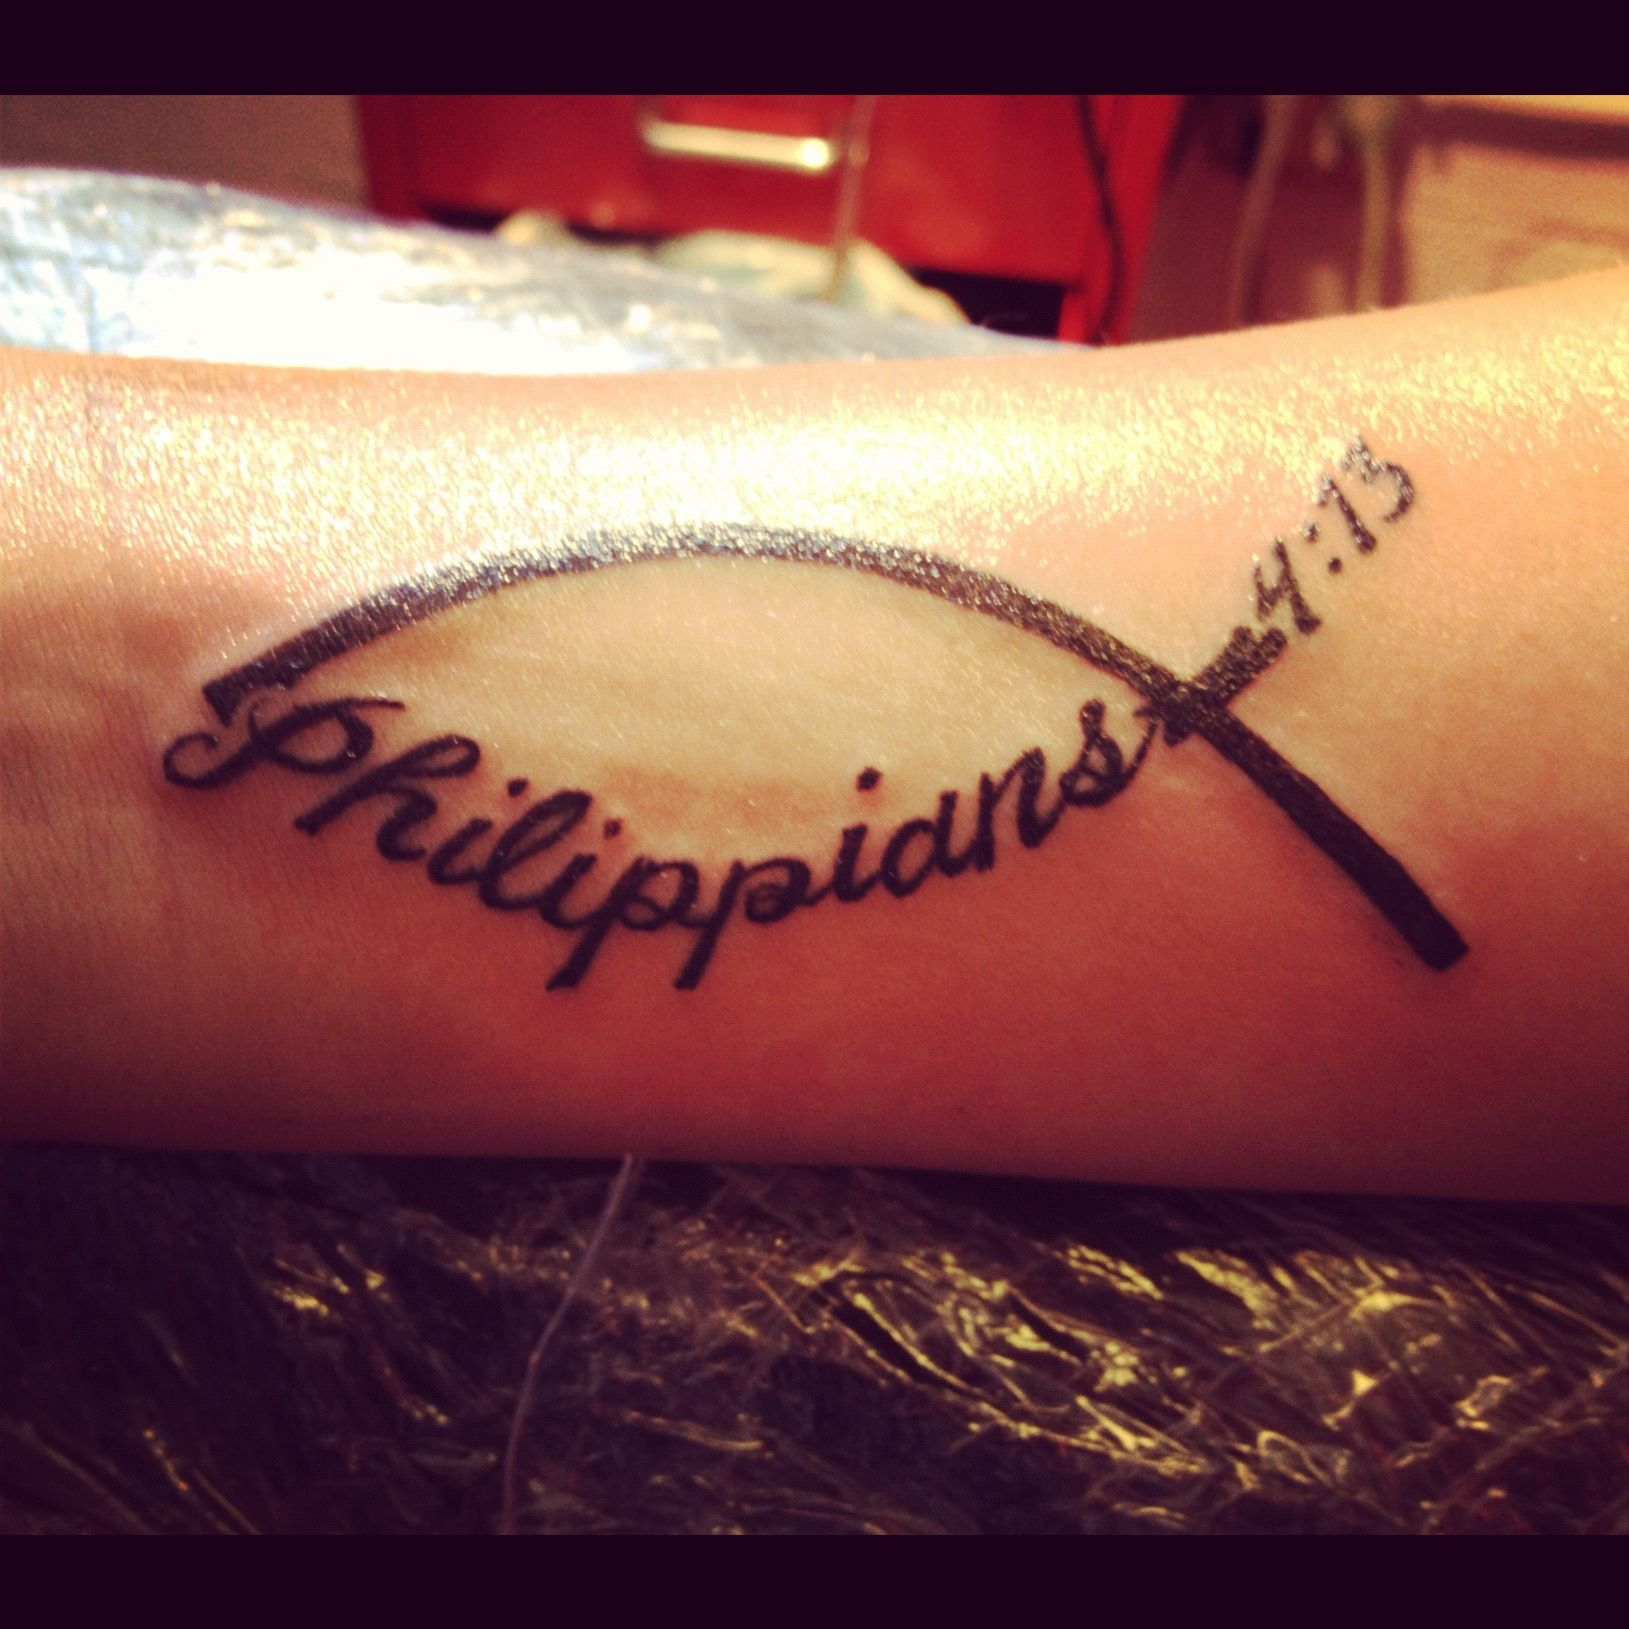 Can I do tattoos